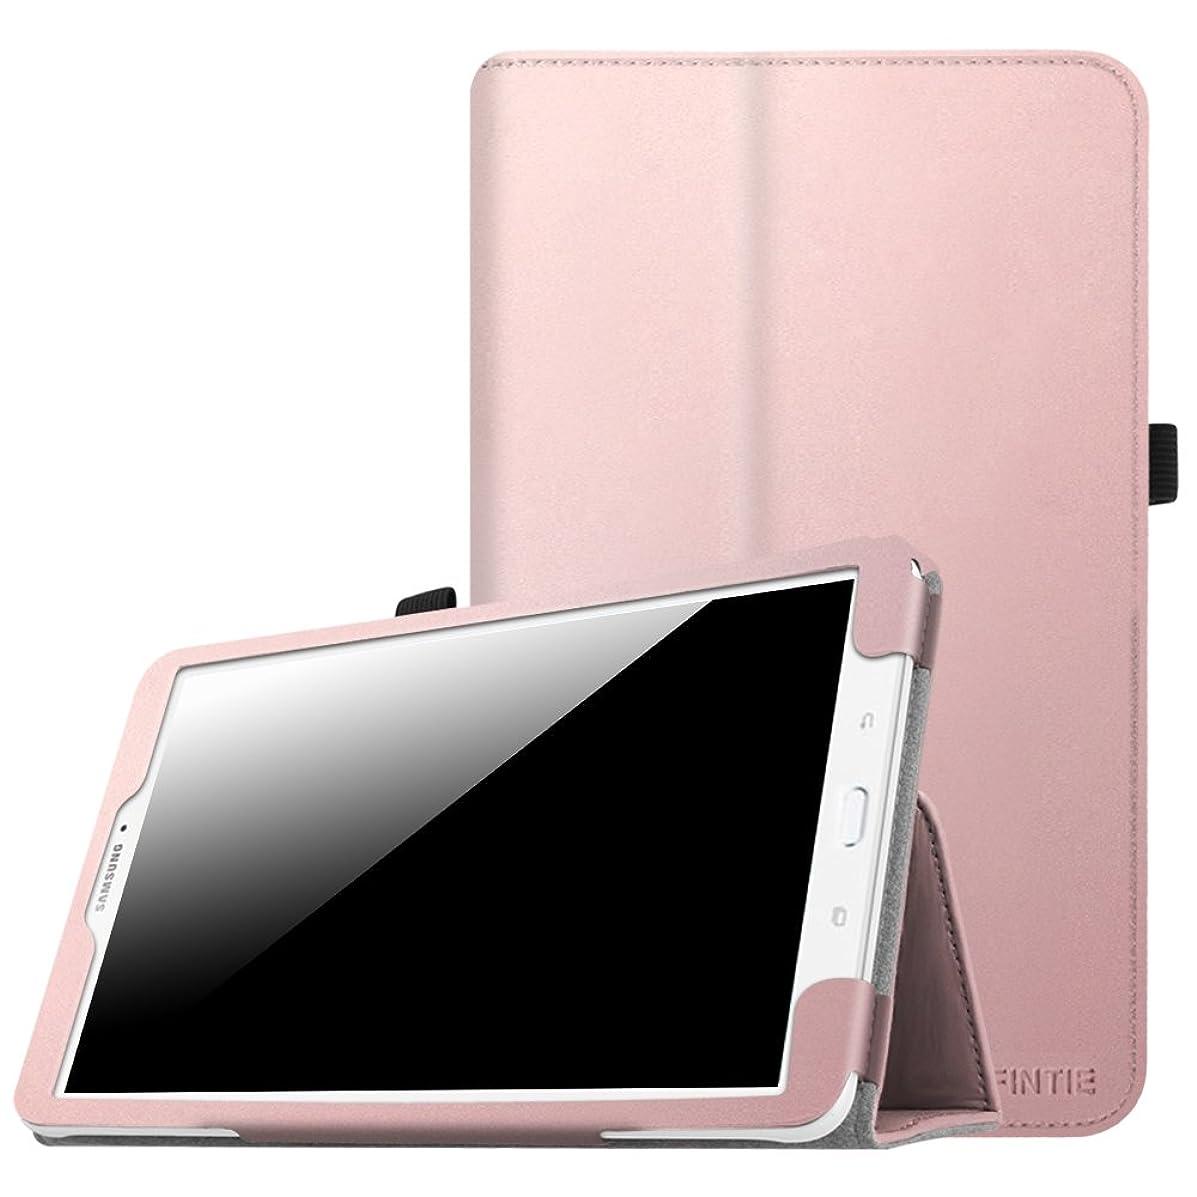 Fintie Folio Case for Samsung Galaxy Tab E 9.6 - Slim Fit Premium Vegan Leather Cover for Tab E/Tab E Nook 9.6-Inch Tablet (SM-T560/T561/T565 & SM-T567V Verizon 4G LTE Version), Rose Gold